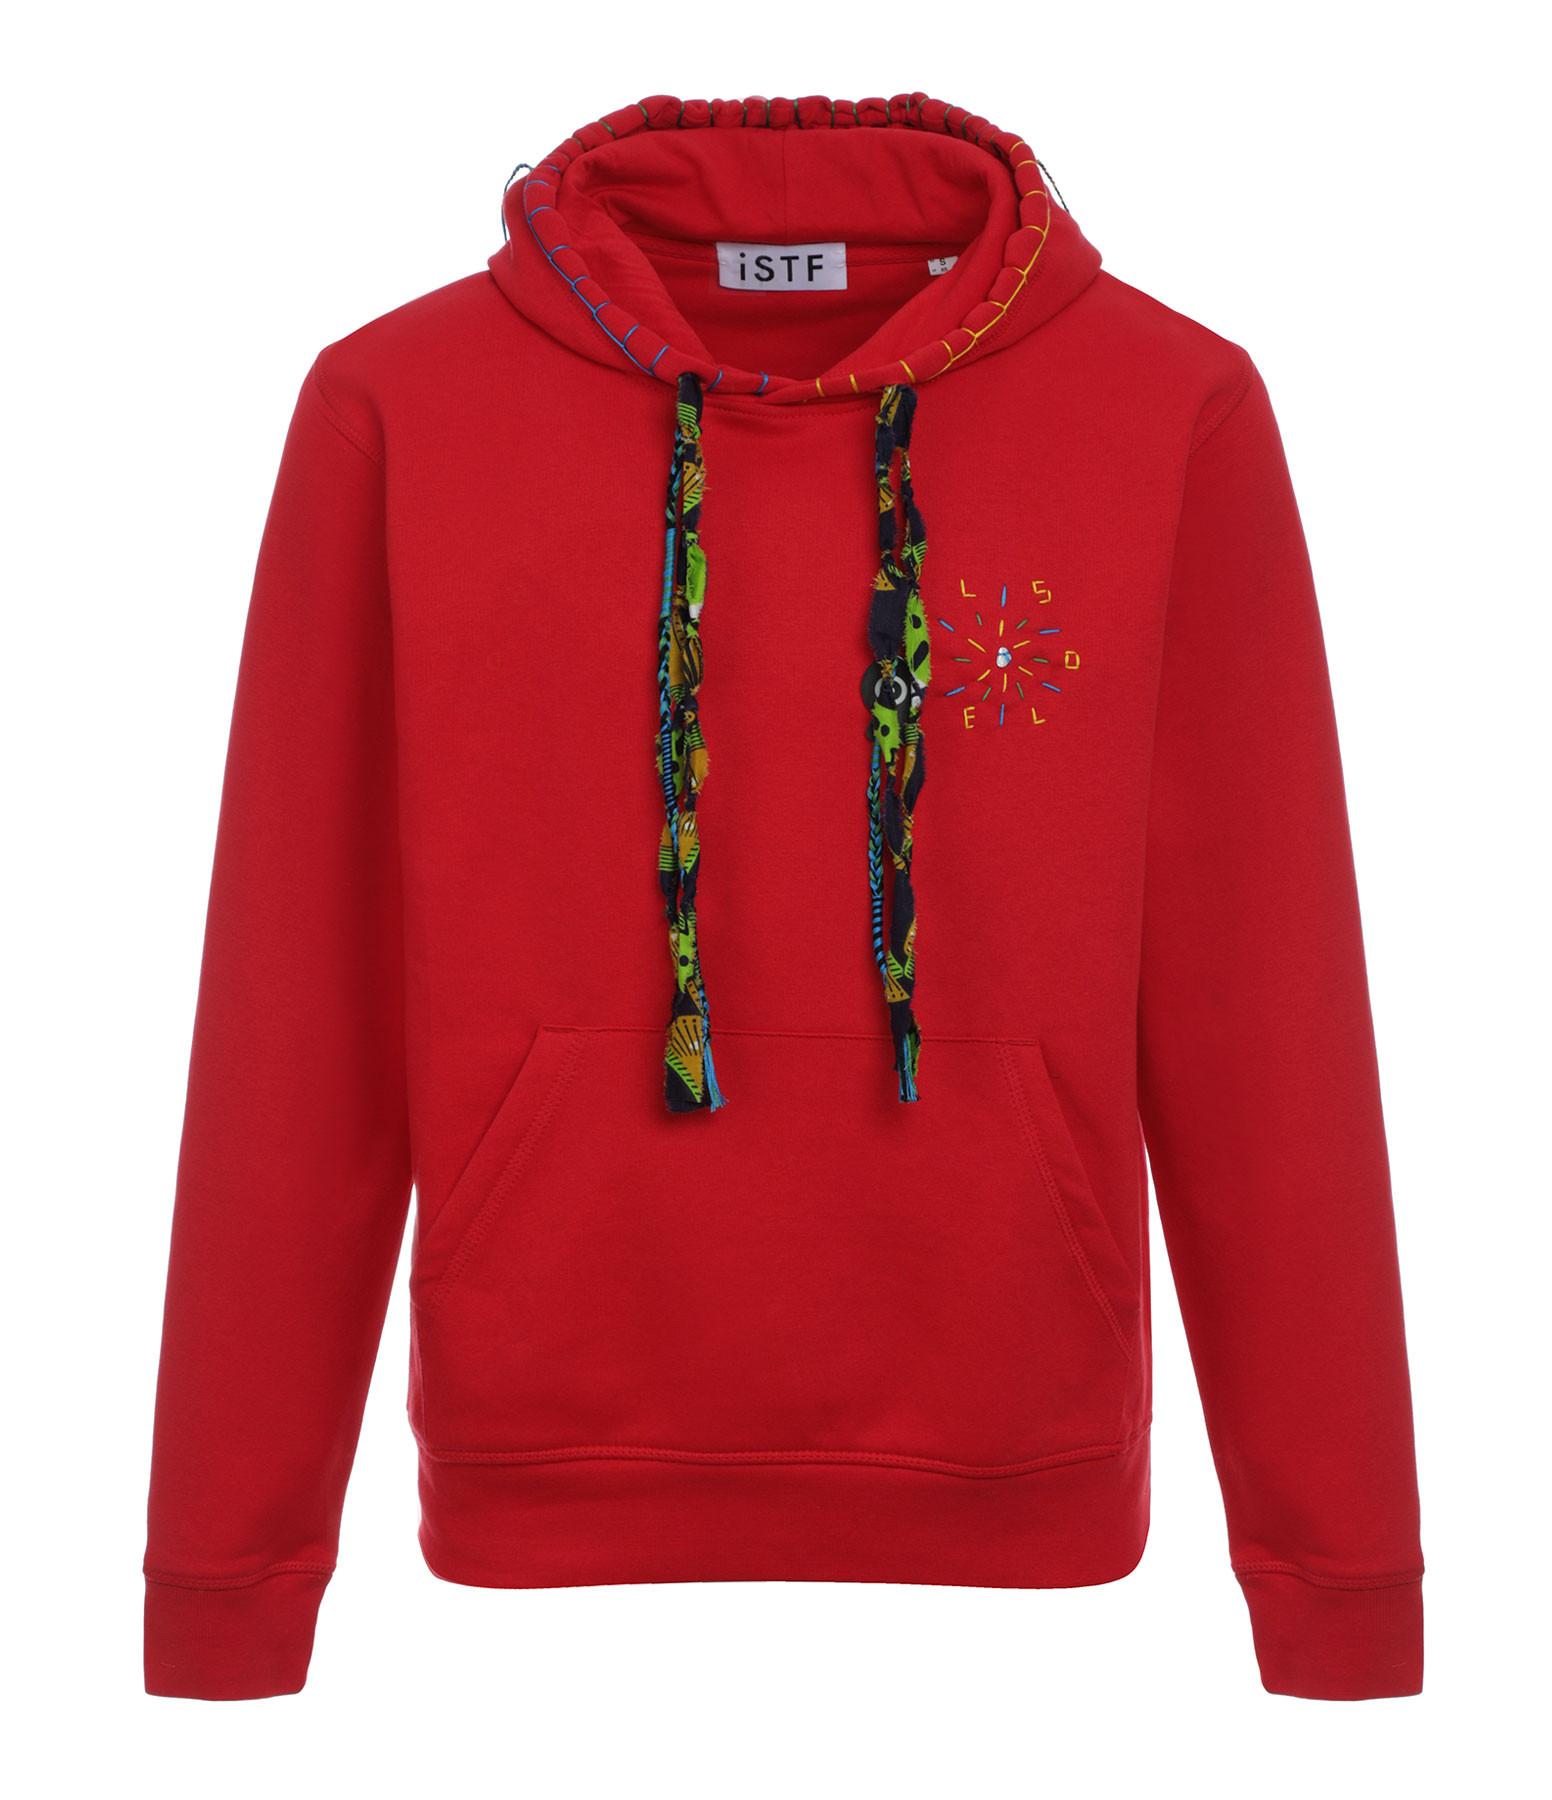 I SAVED THE FISH - Sweatshirt Hoodie Soleil Coton Biologique Rouge